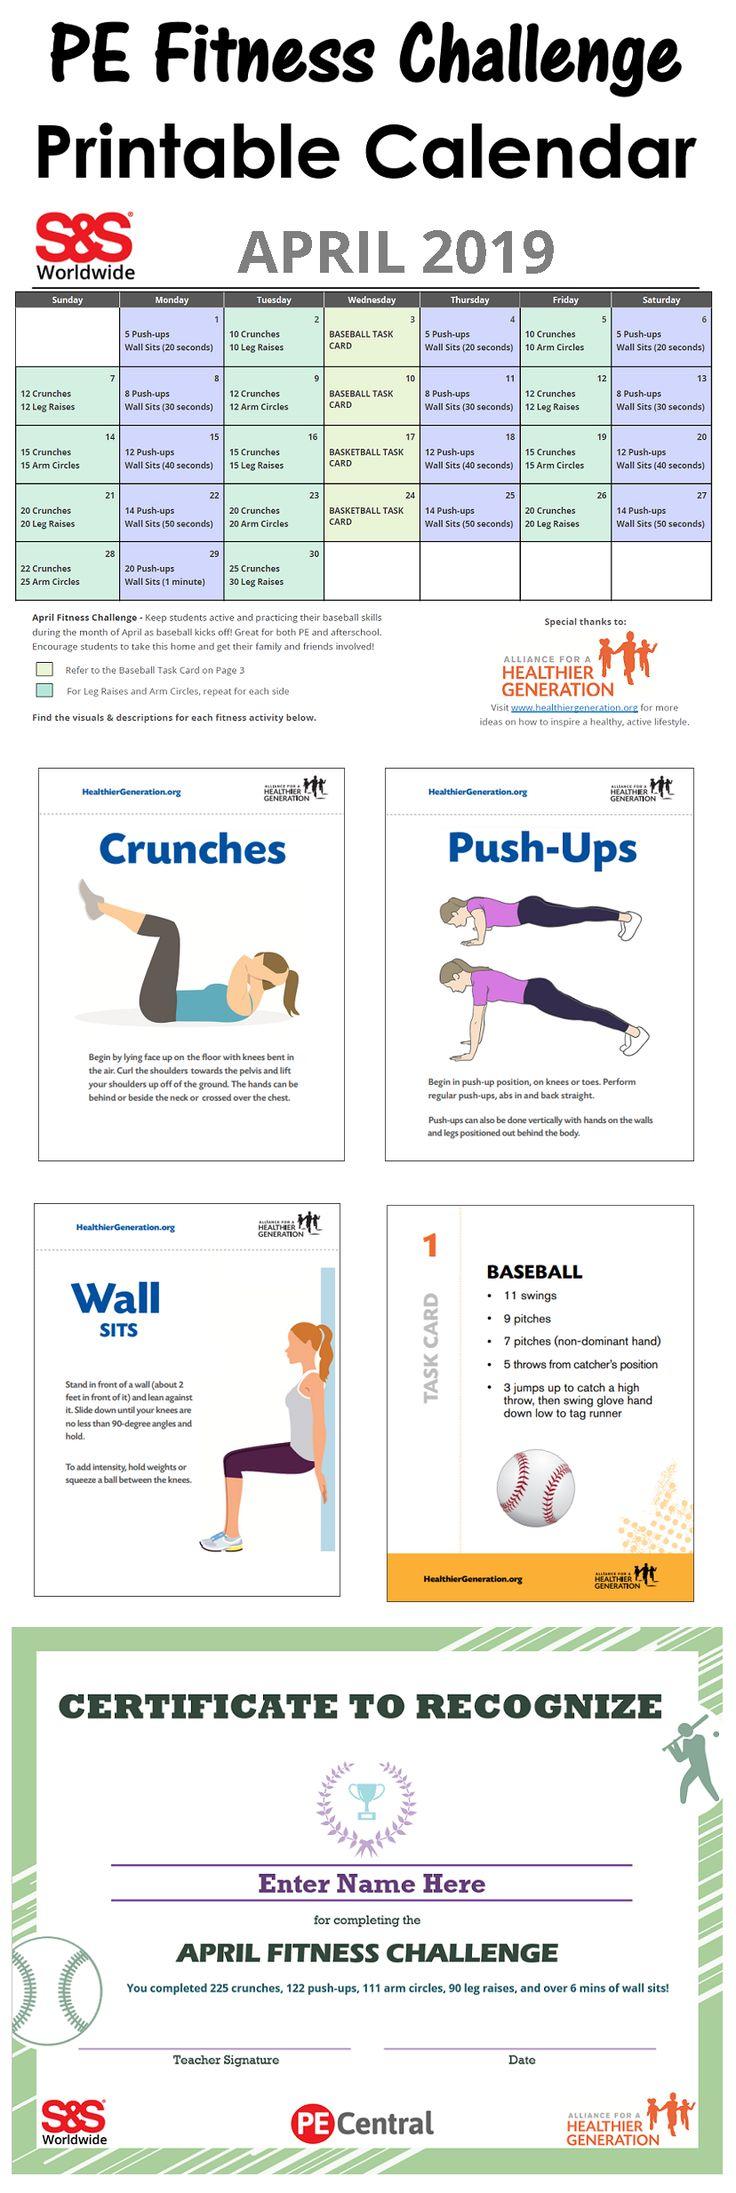 April Printable Fitness Challenge Calendar | Workout Regarding April Fitness Challenge